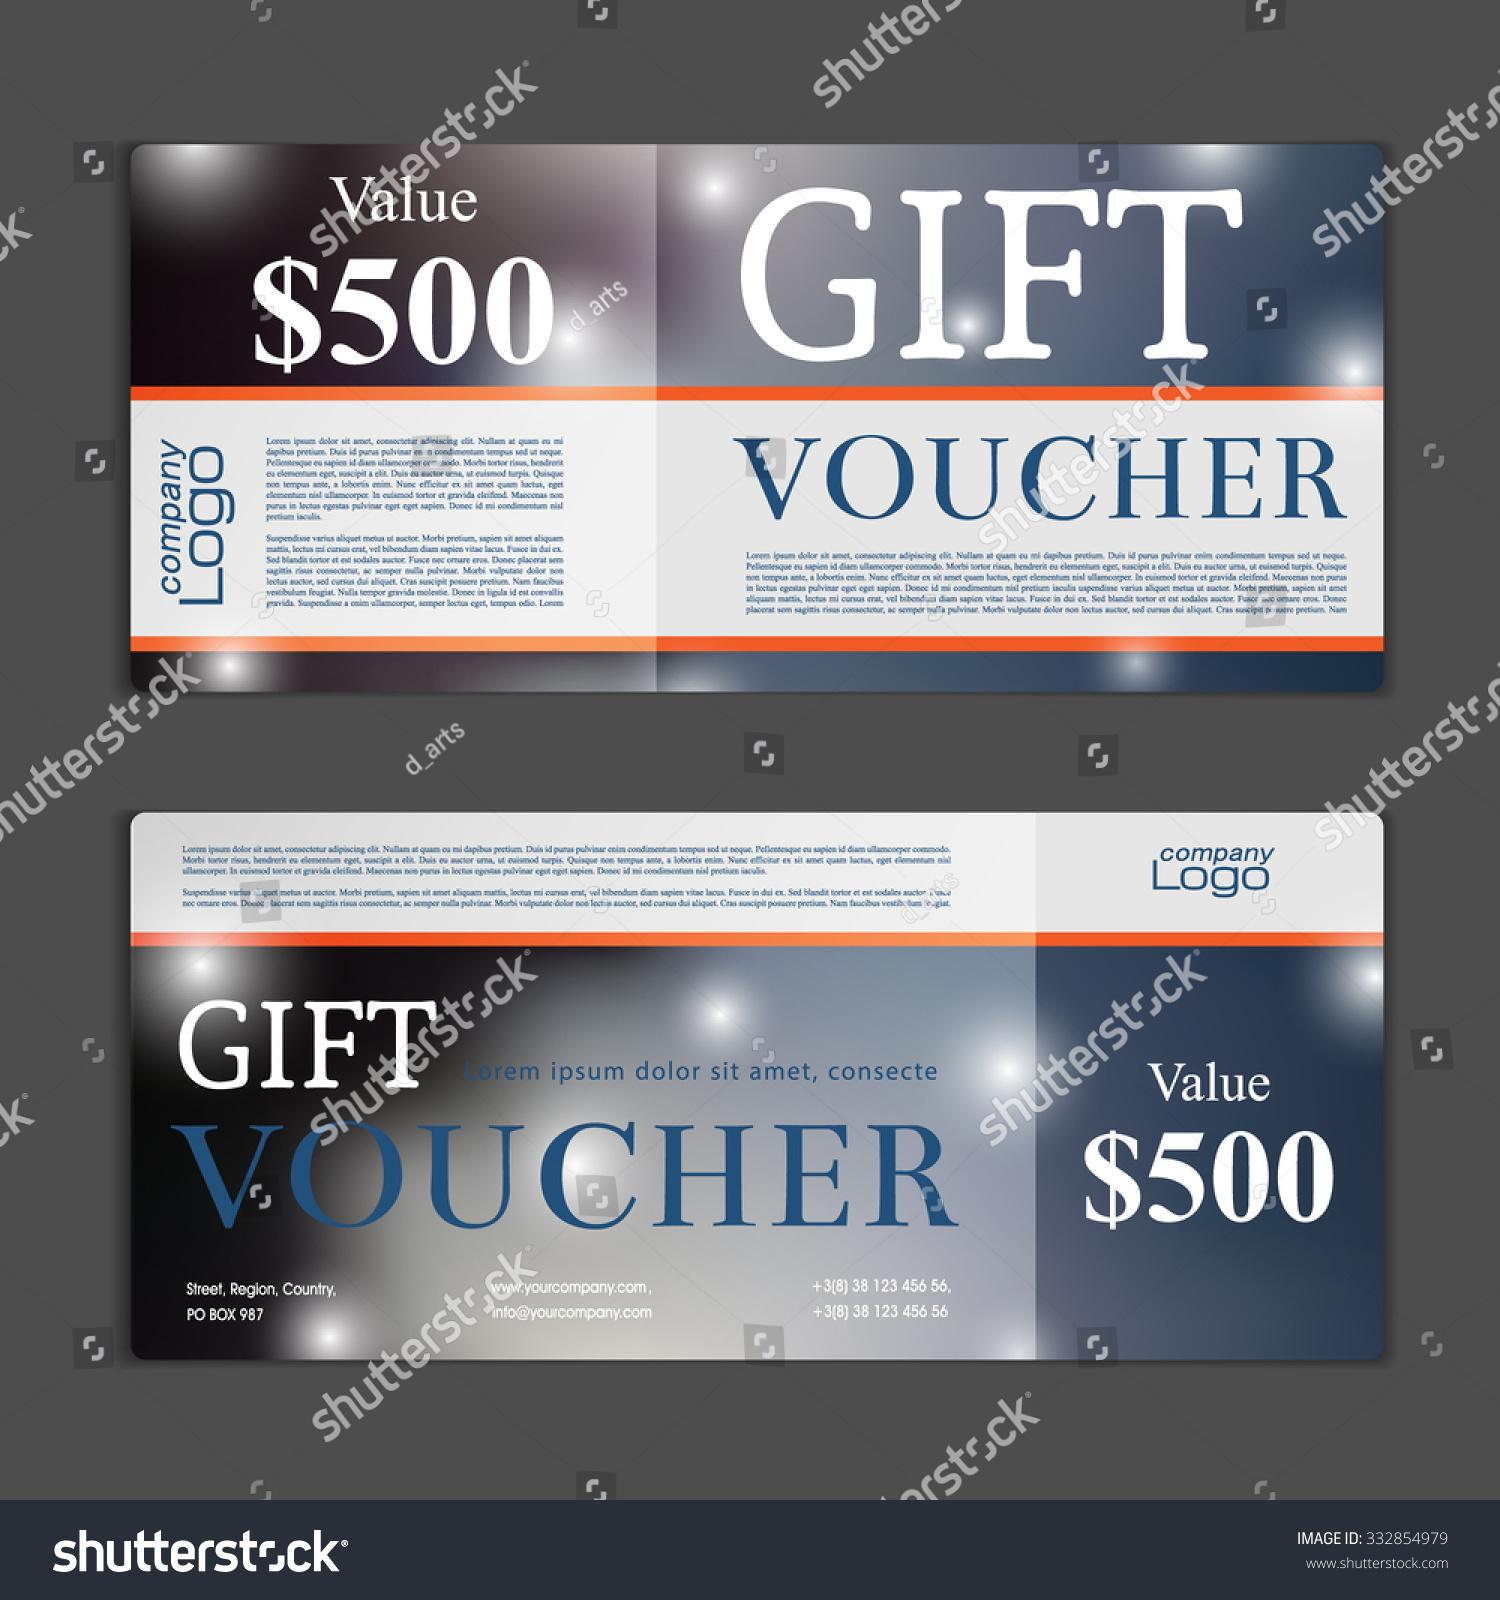 Gift Voucher Template Stock Vector 332854979 - Shutterstock